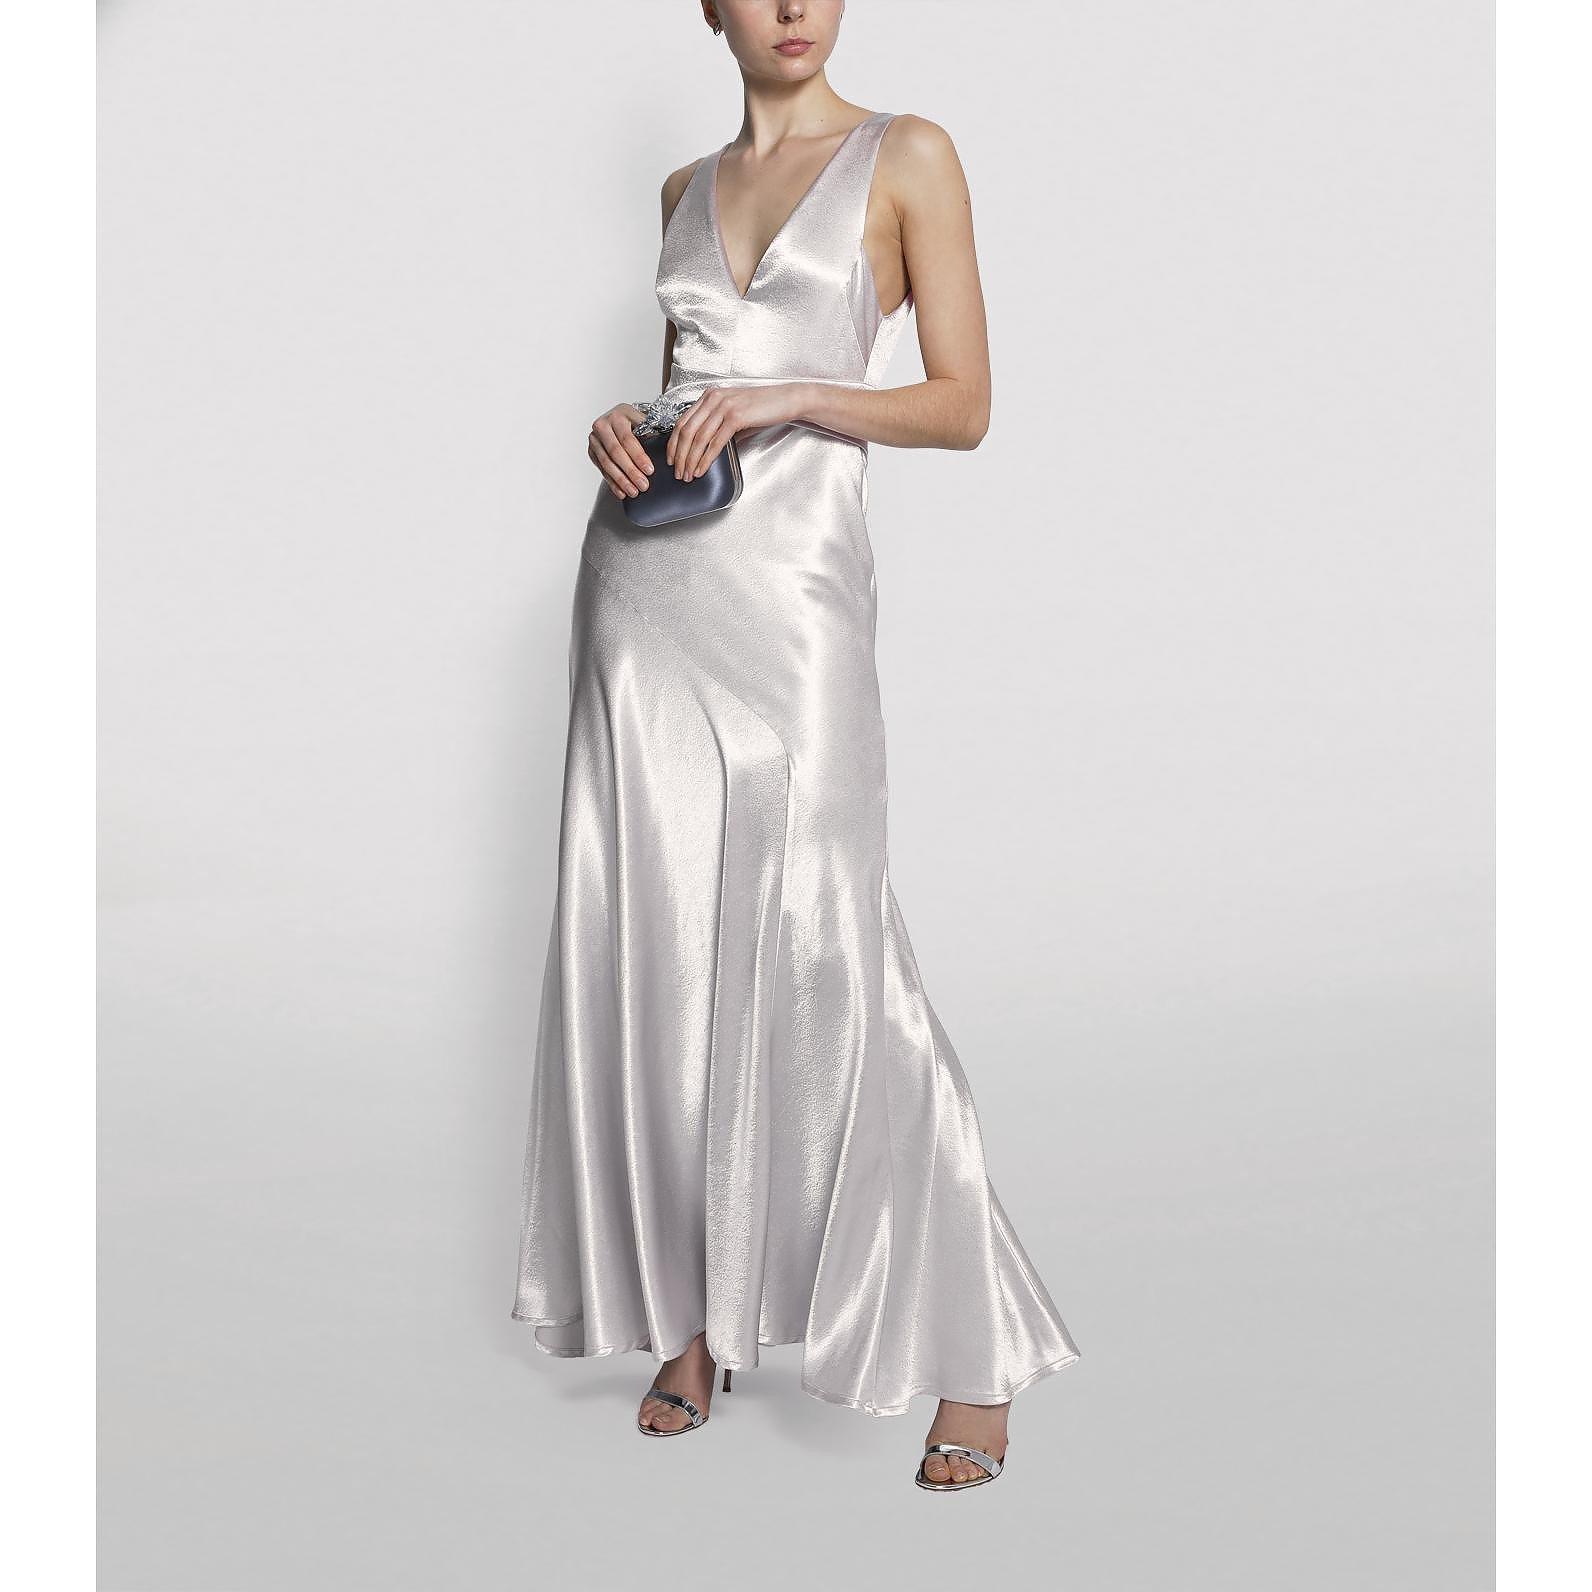 Galvan London Bella Satin Evening Gown